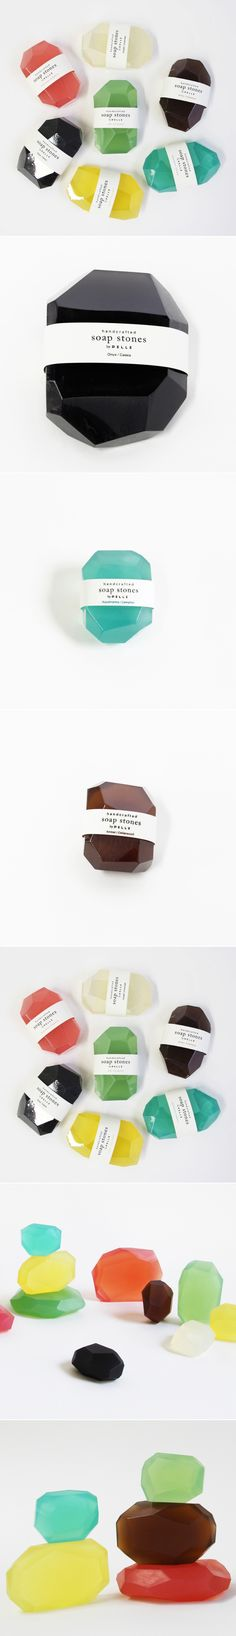 Soap Stones | http://www.thedieline.com/blog/2014/4/23/pelle-soap-stones